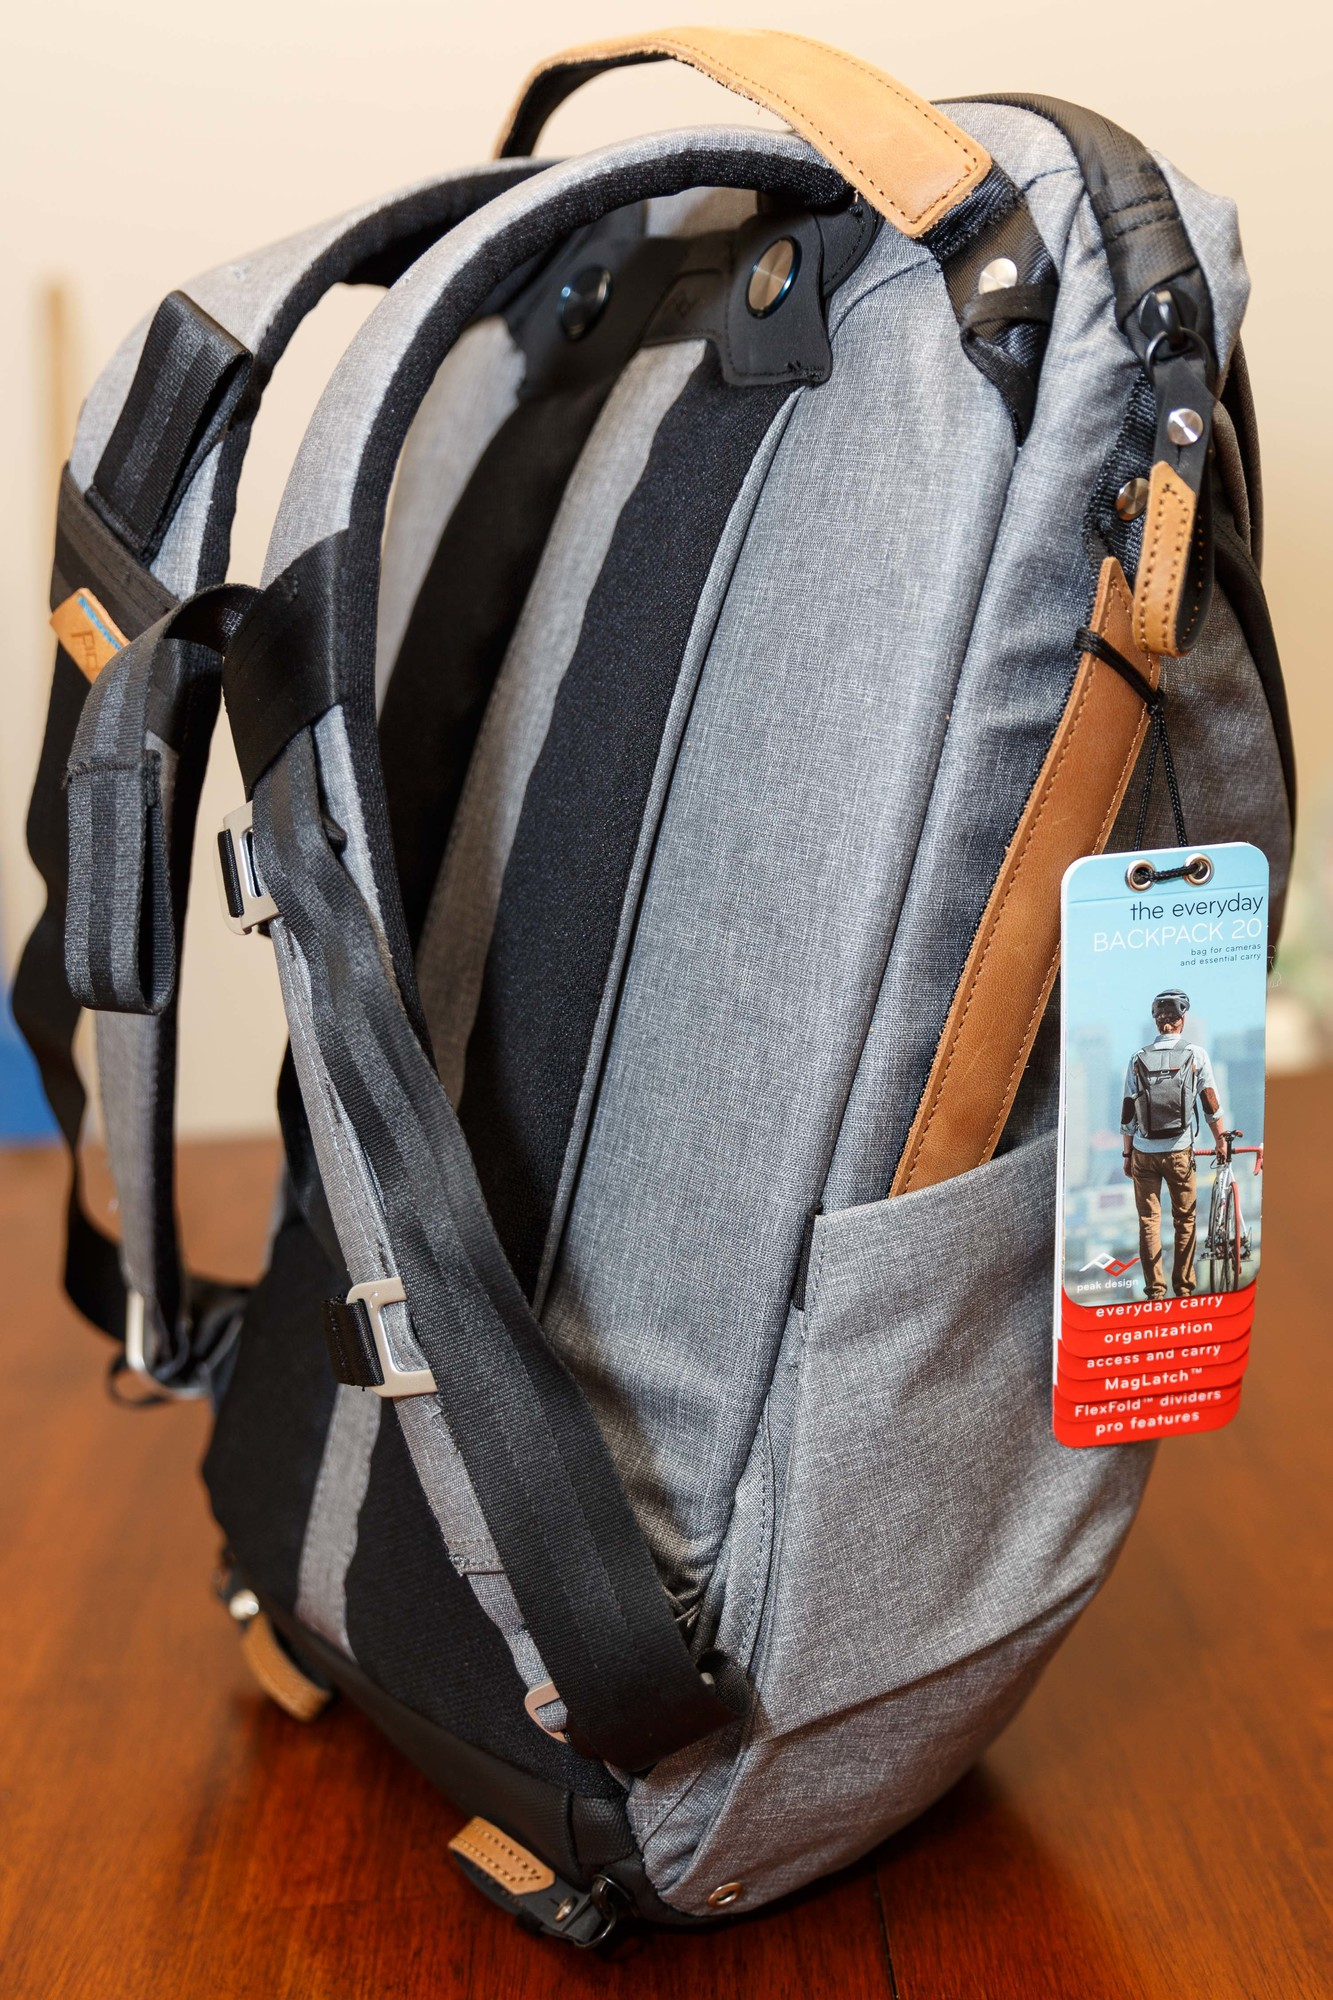 Jual Murah Peak Design Everyday Backpack 20l Ash Termurah 2018 Tas Kamera Messenger Charcoal With Field Pouch Abu Sold Slide Jan 19